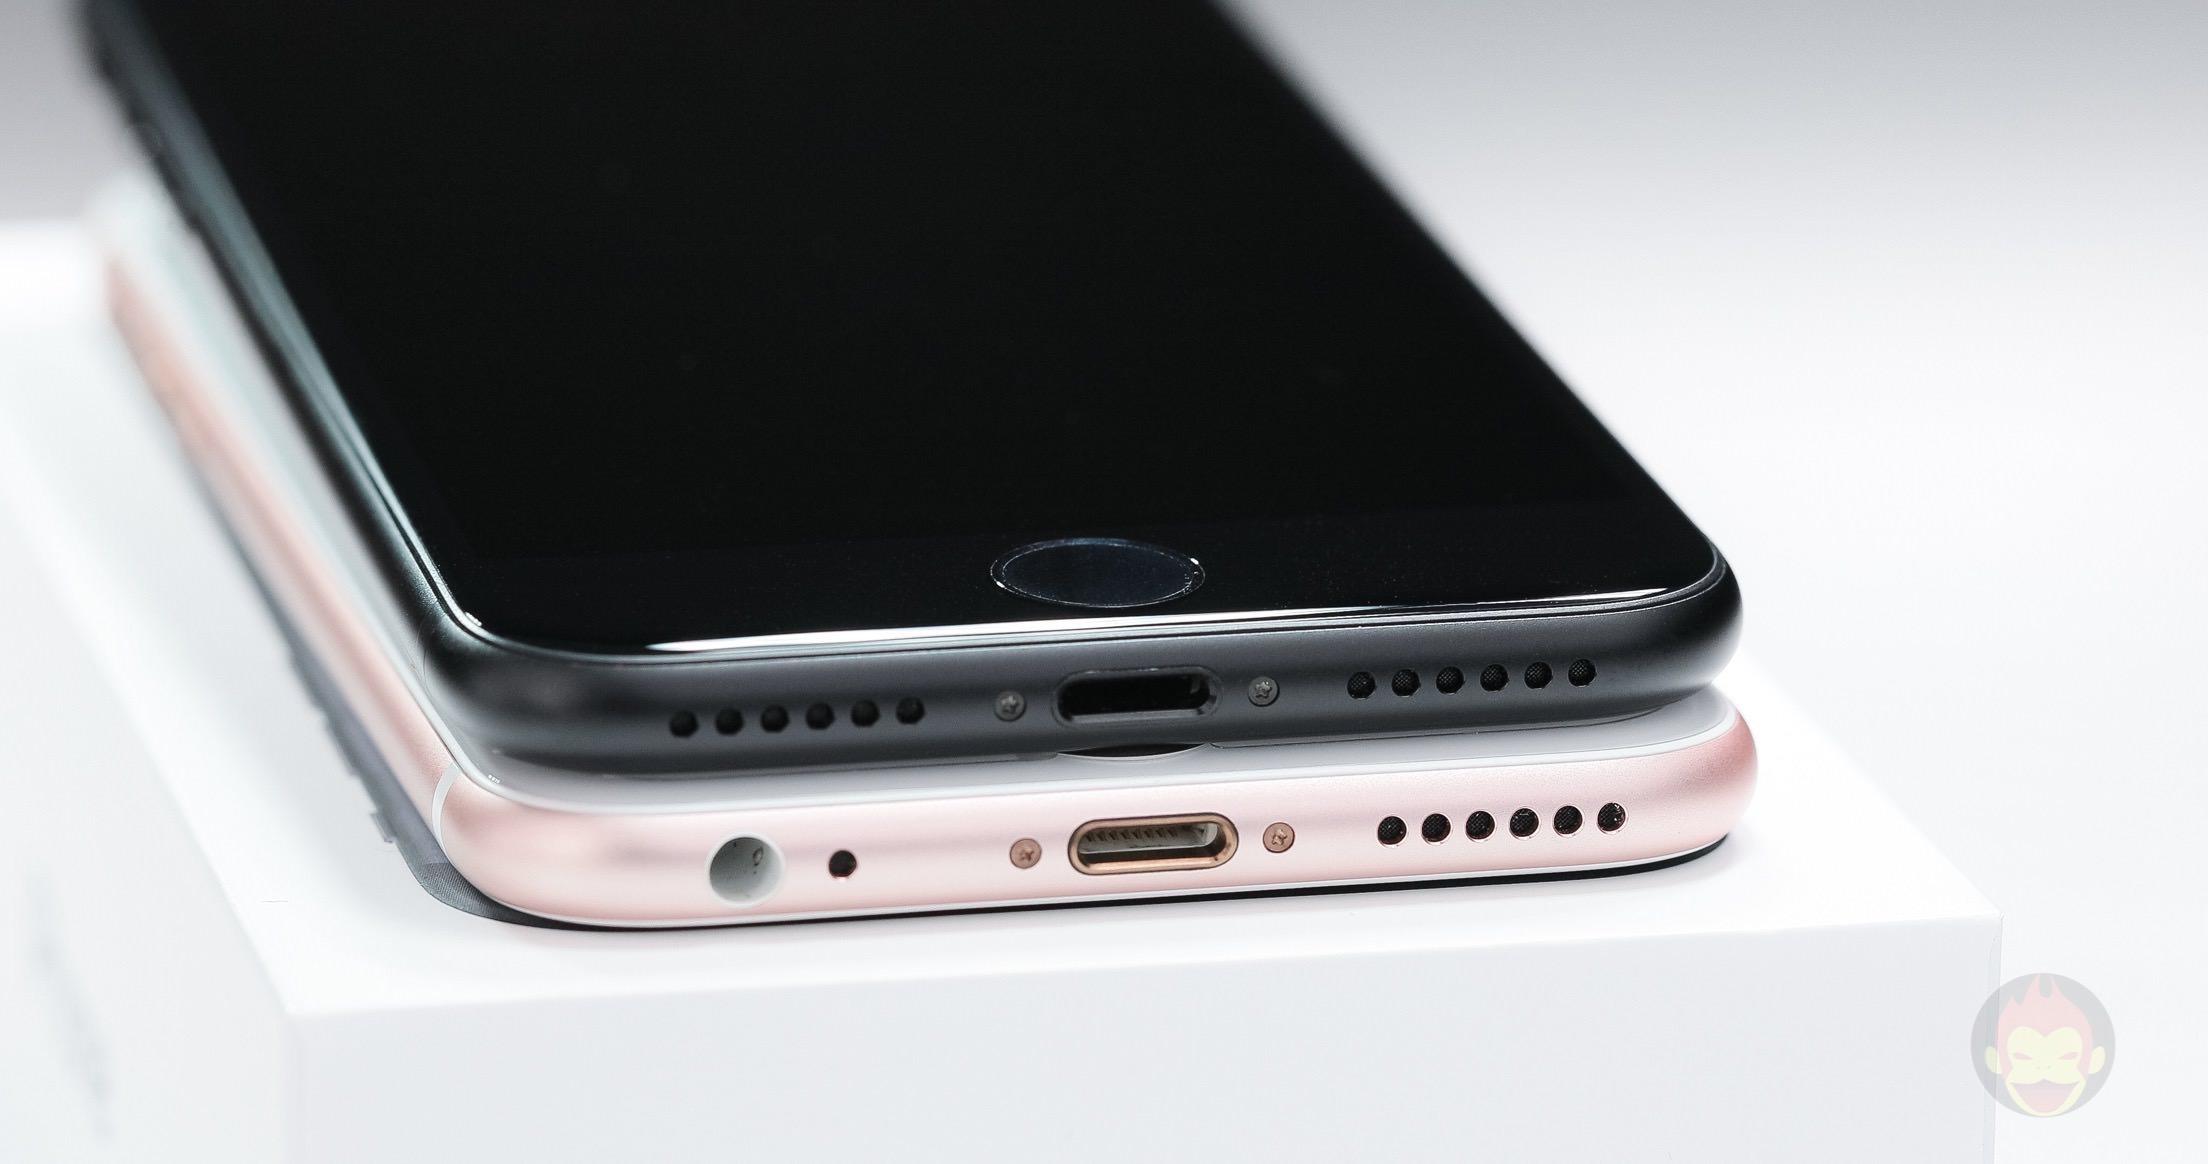 iPhone-7-iPhone-6s-Comparison-01.jpg